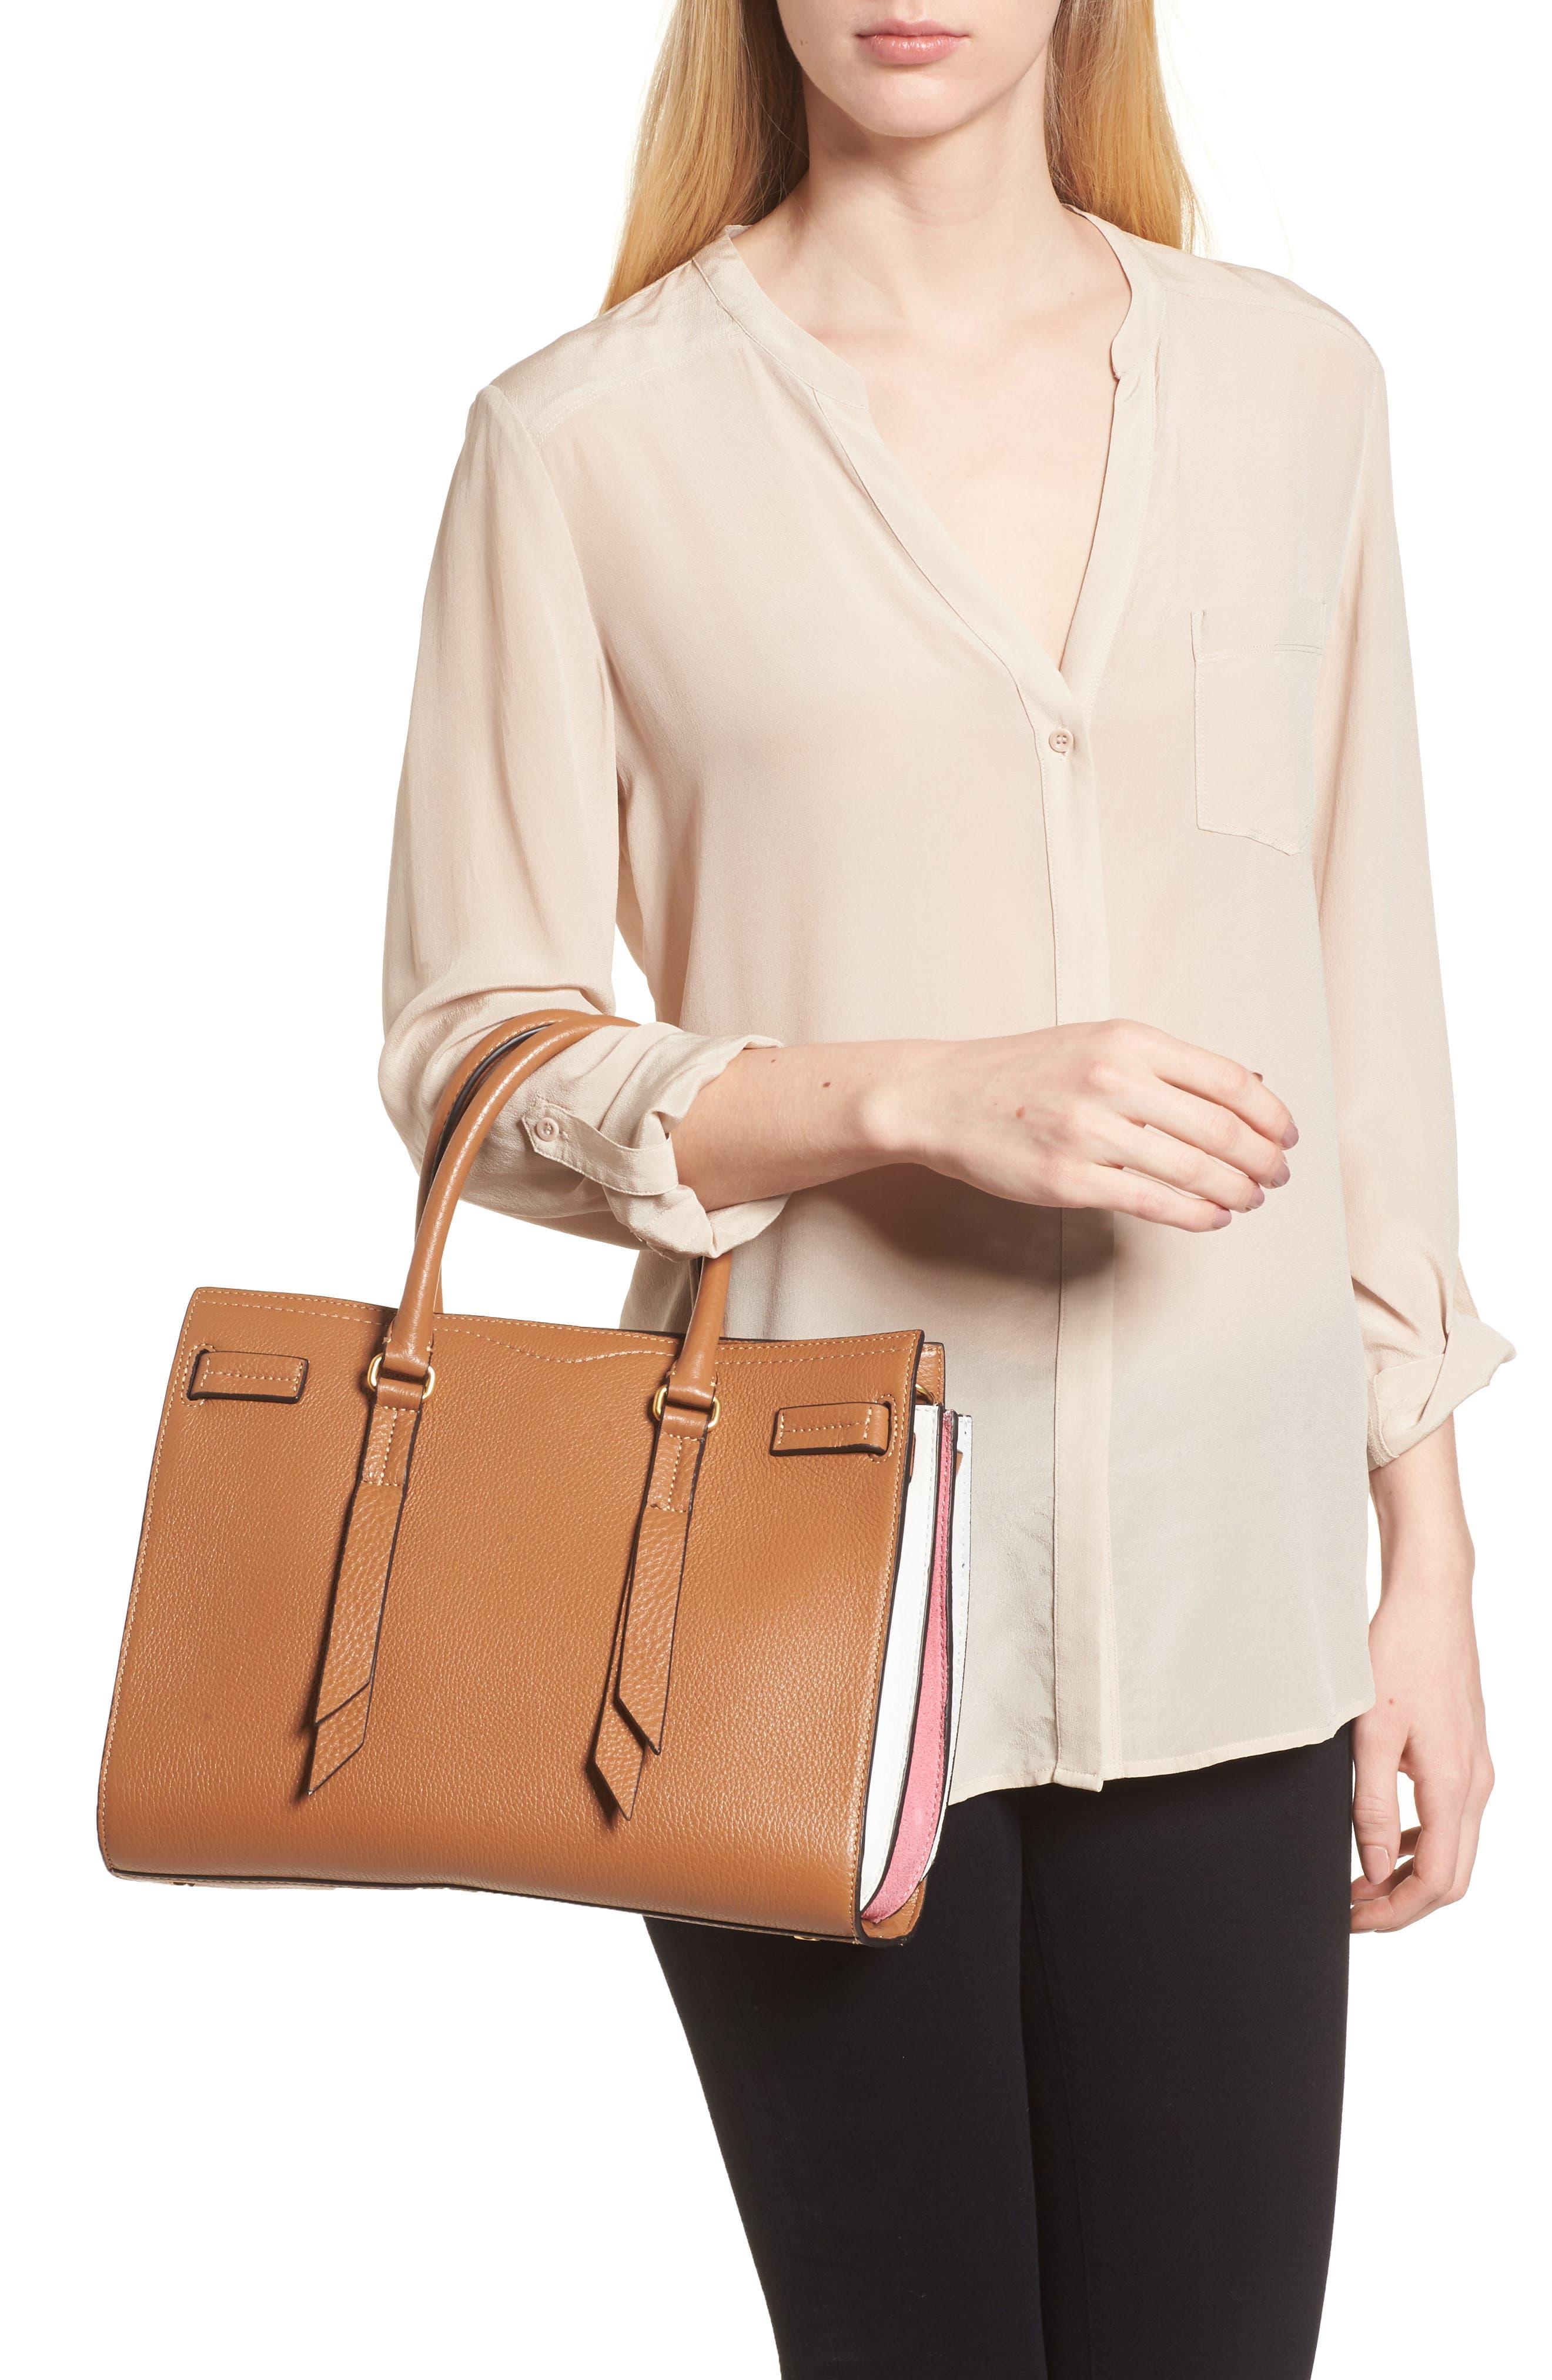 Sherry Calfskin Leather Satchel,                             Alternate thumbnail 2, color,                             Almond Multi